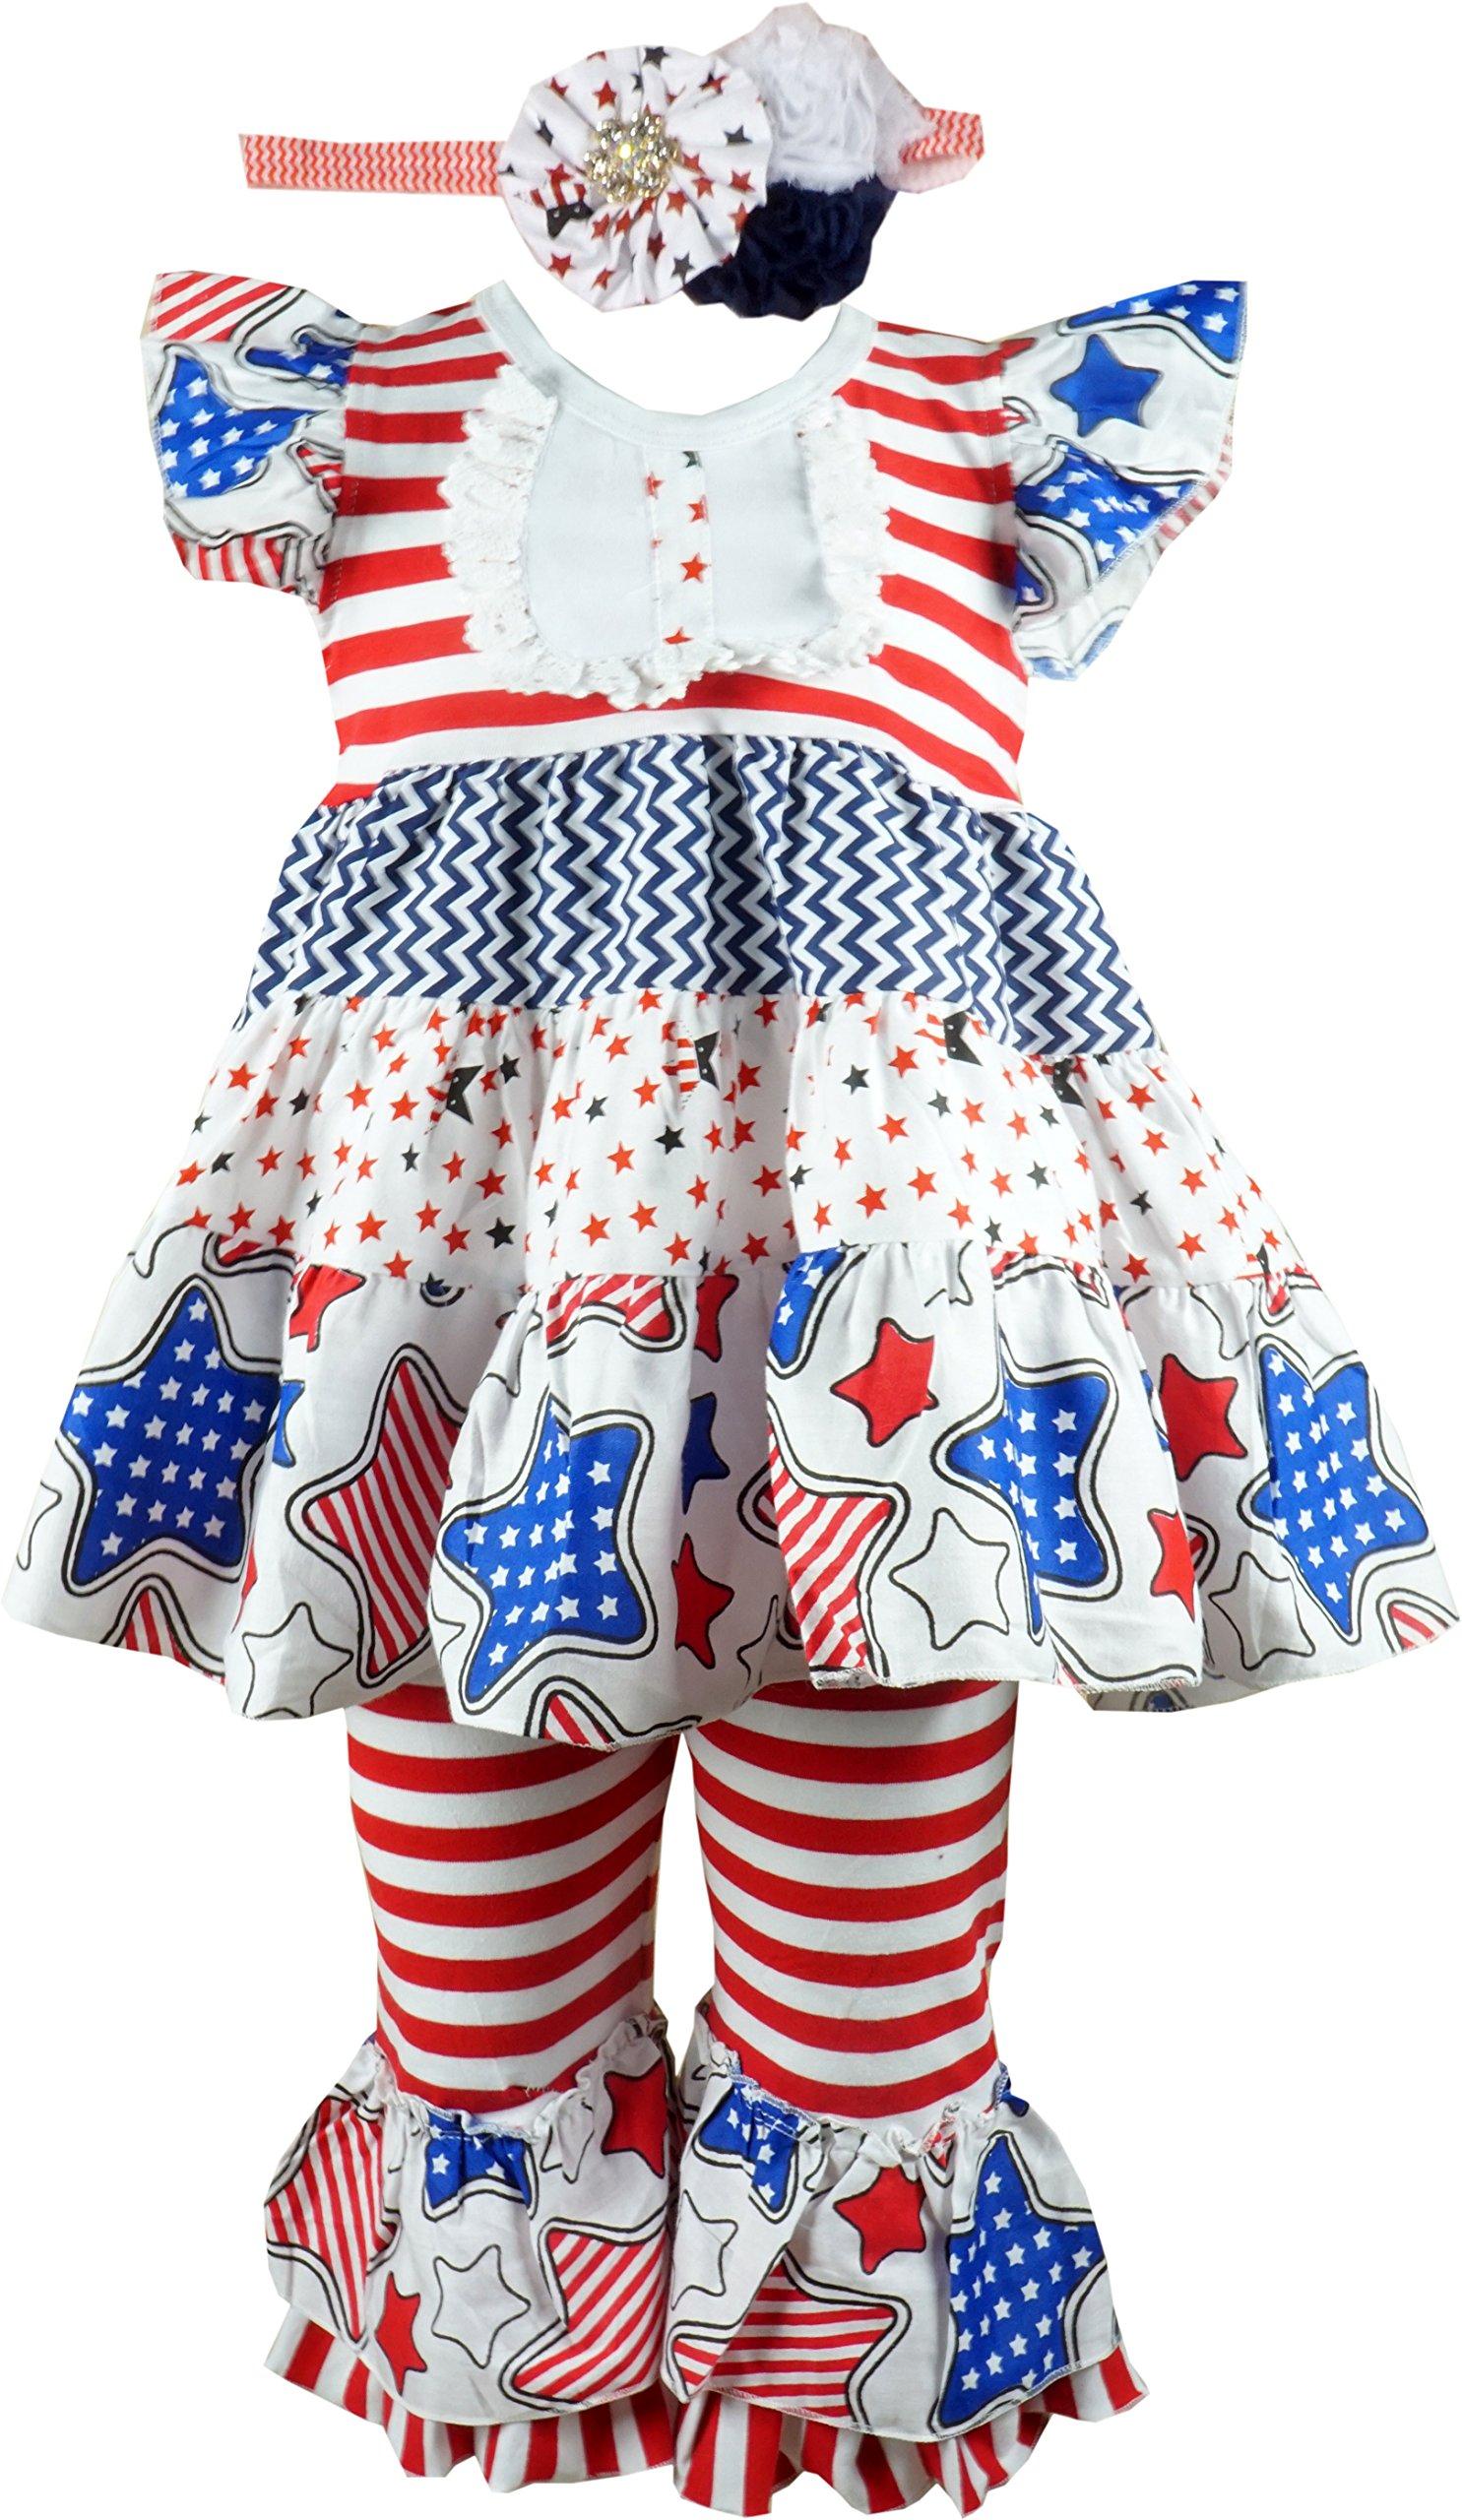 Baby Toddler Little Girls Americana Patriotic Stars Clothing Set 4T